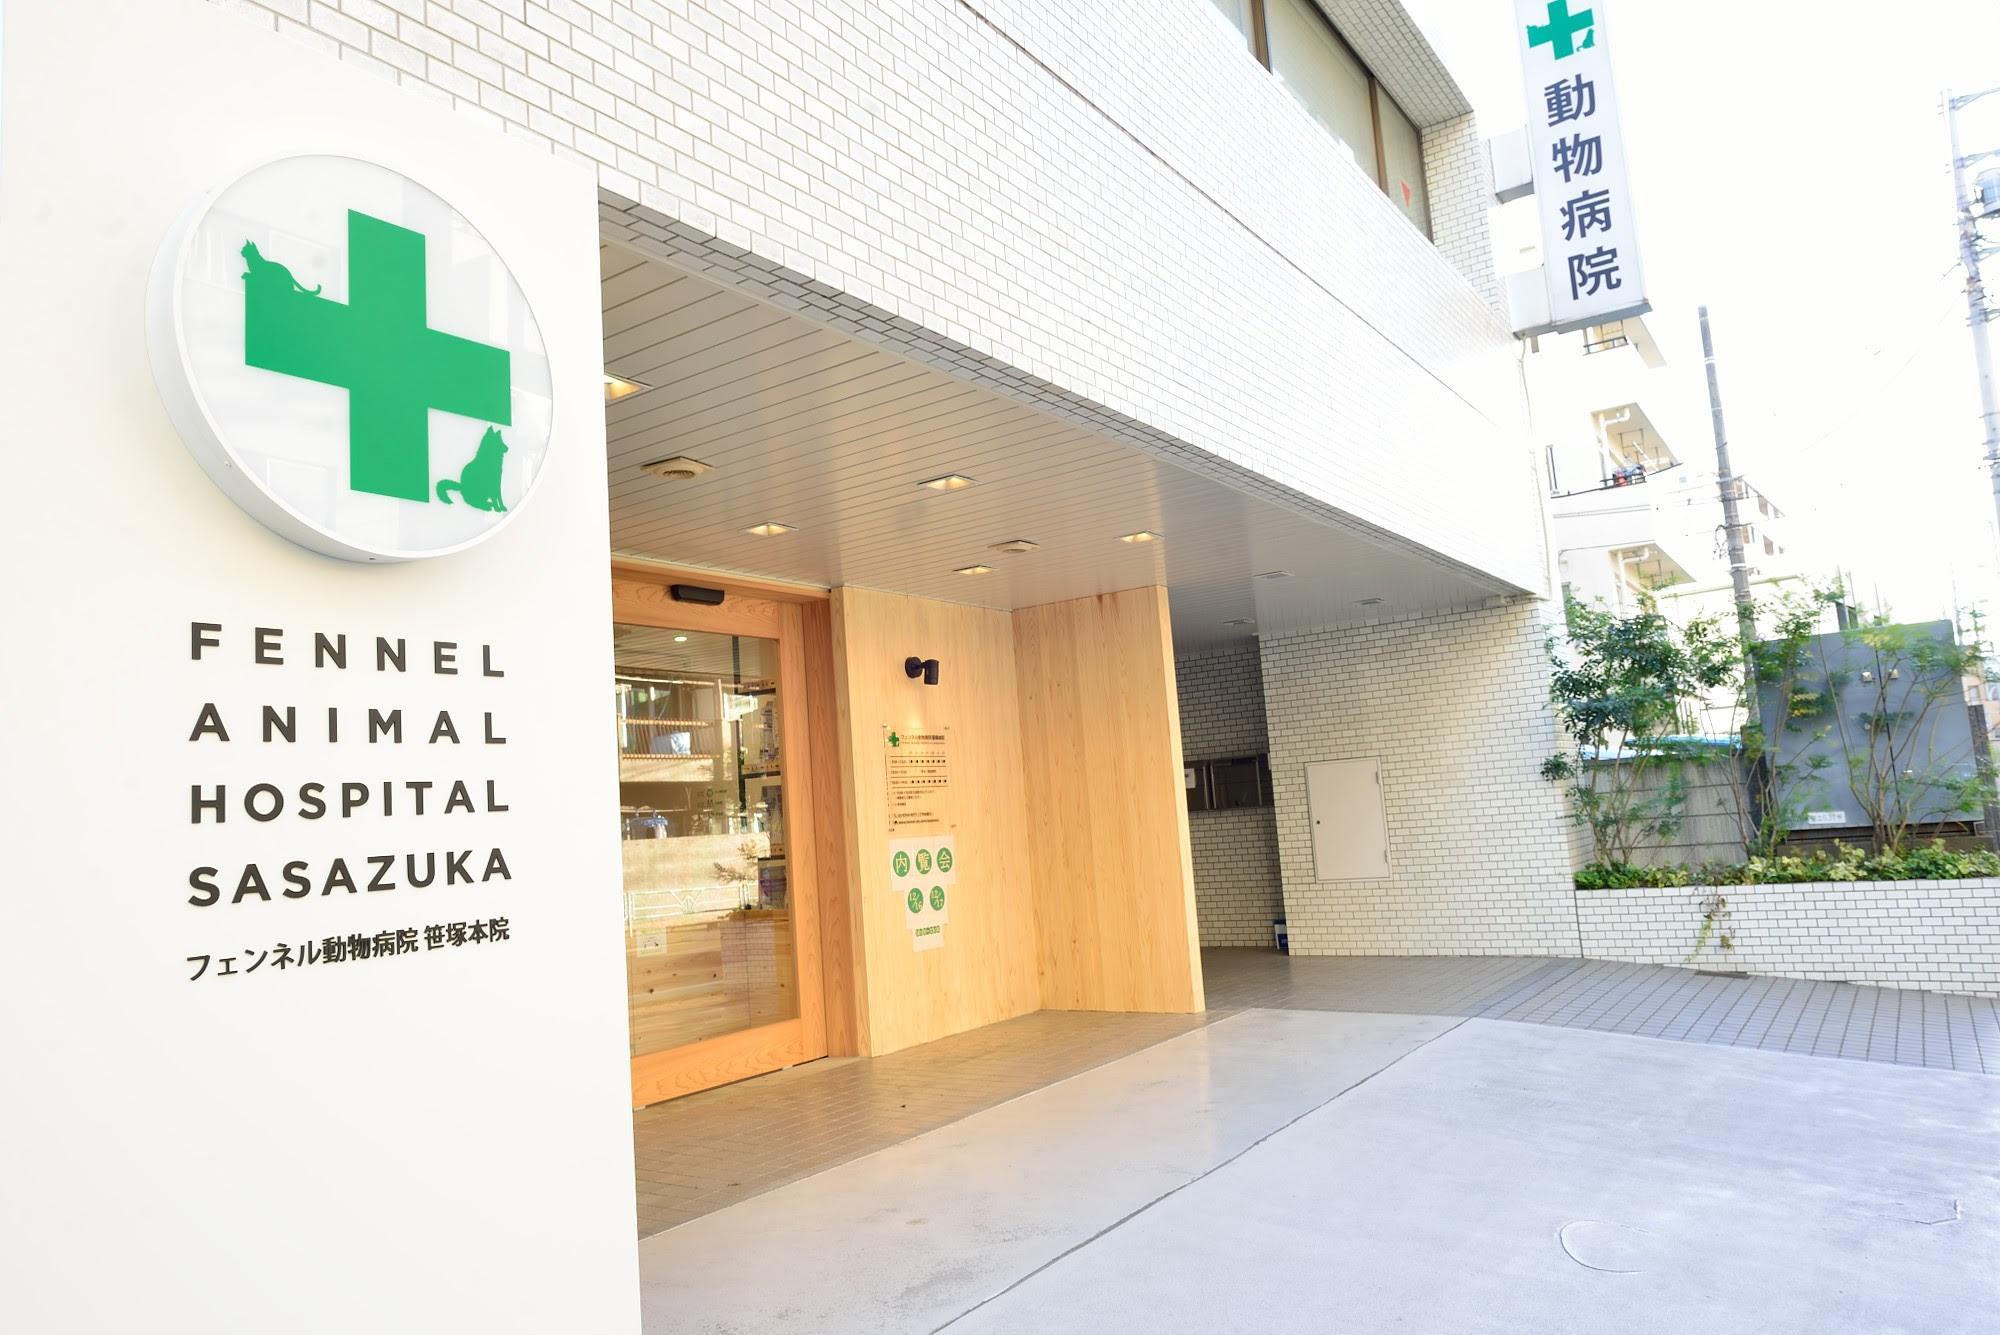 <新卒獣医師>実習・病院見学可能!フェンネル動物病院